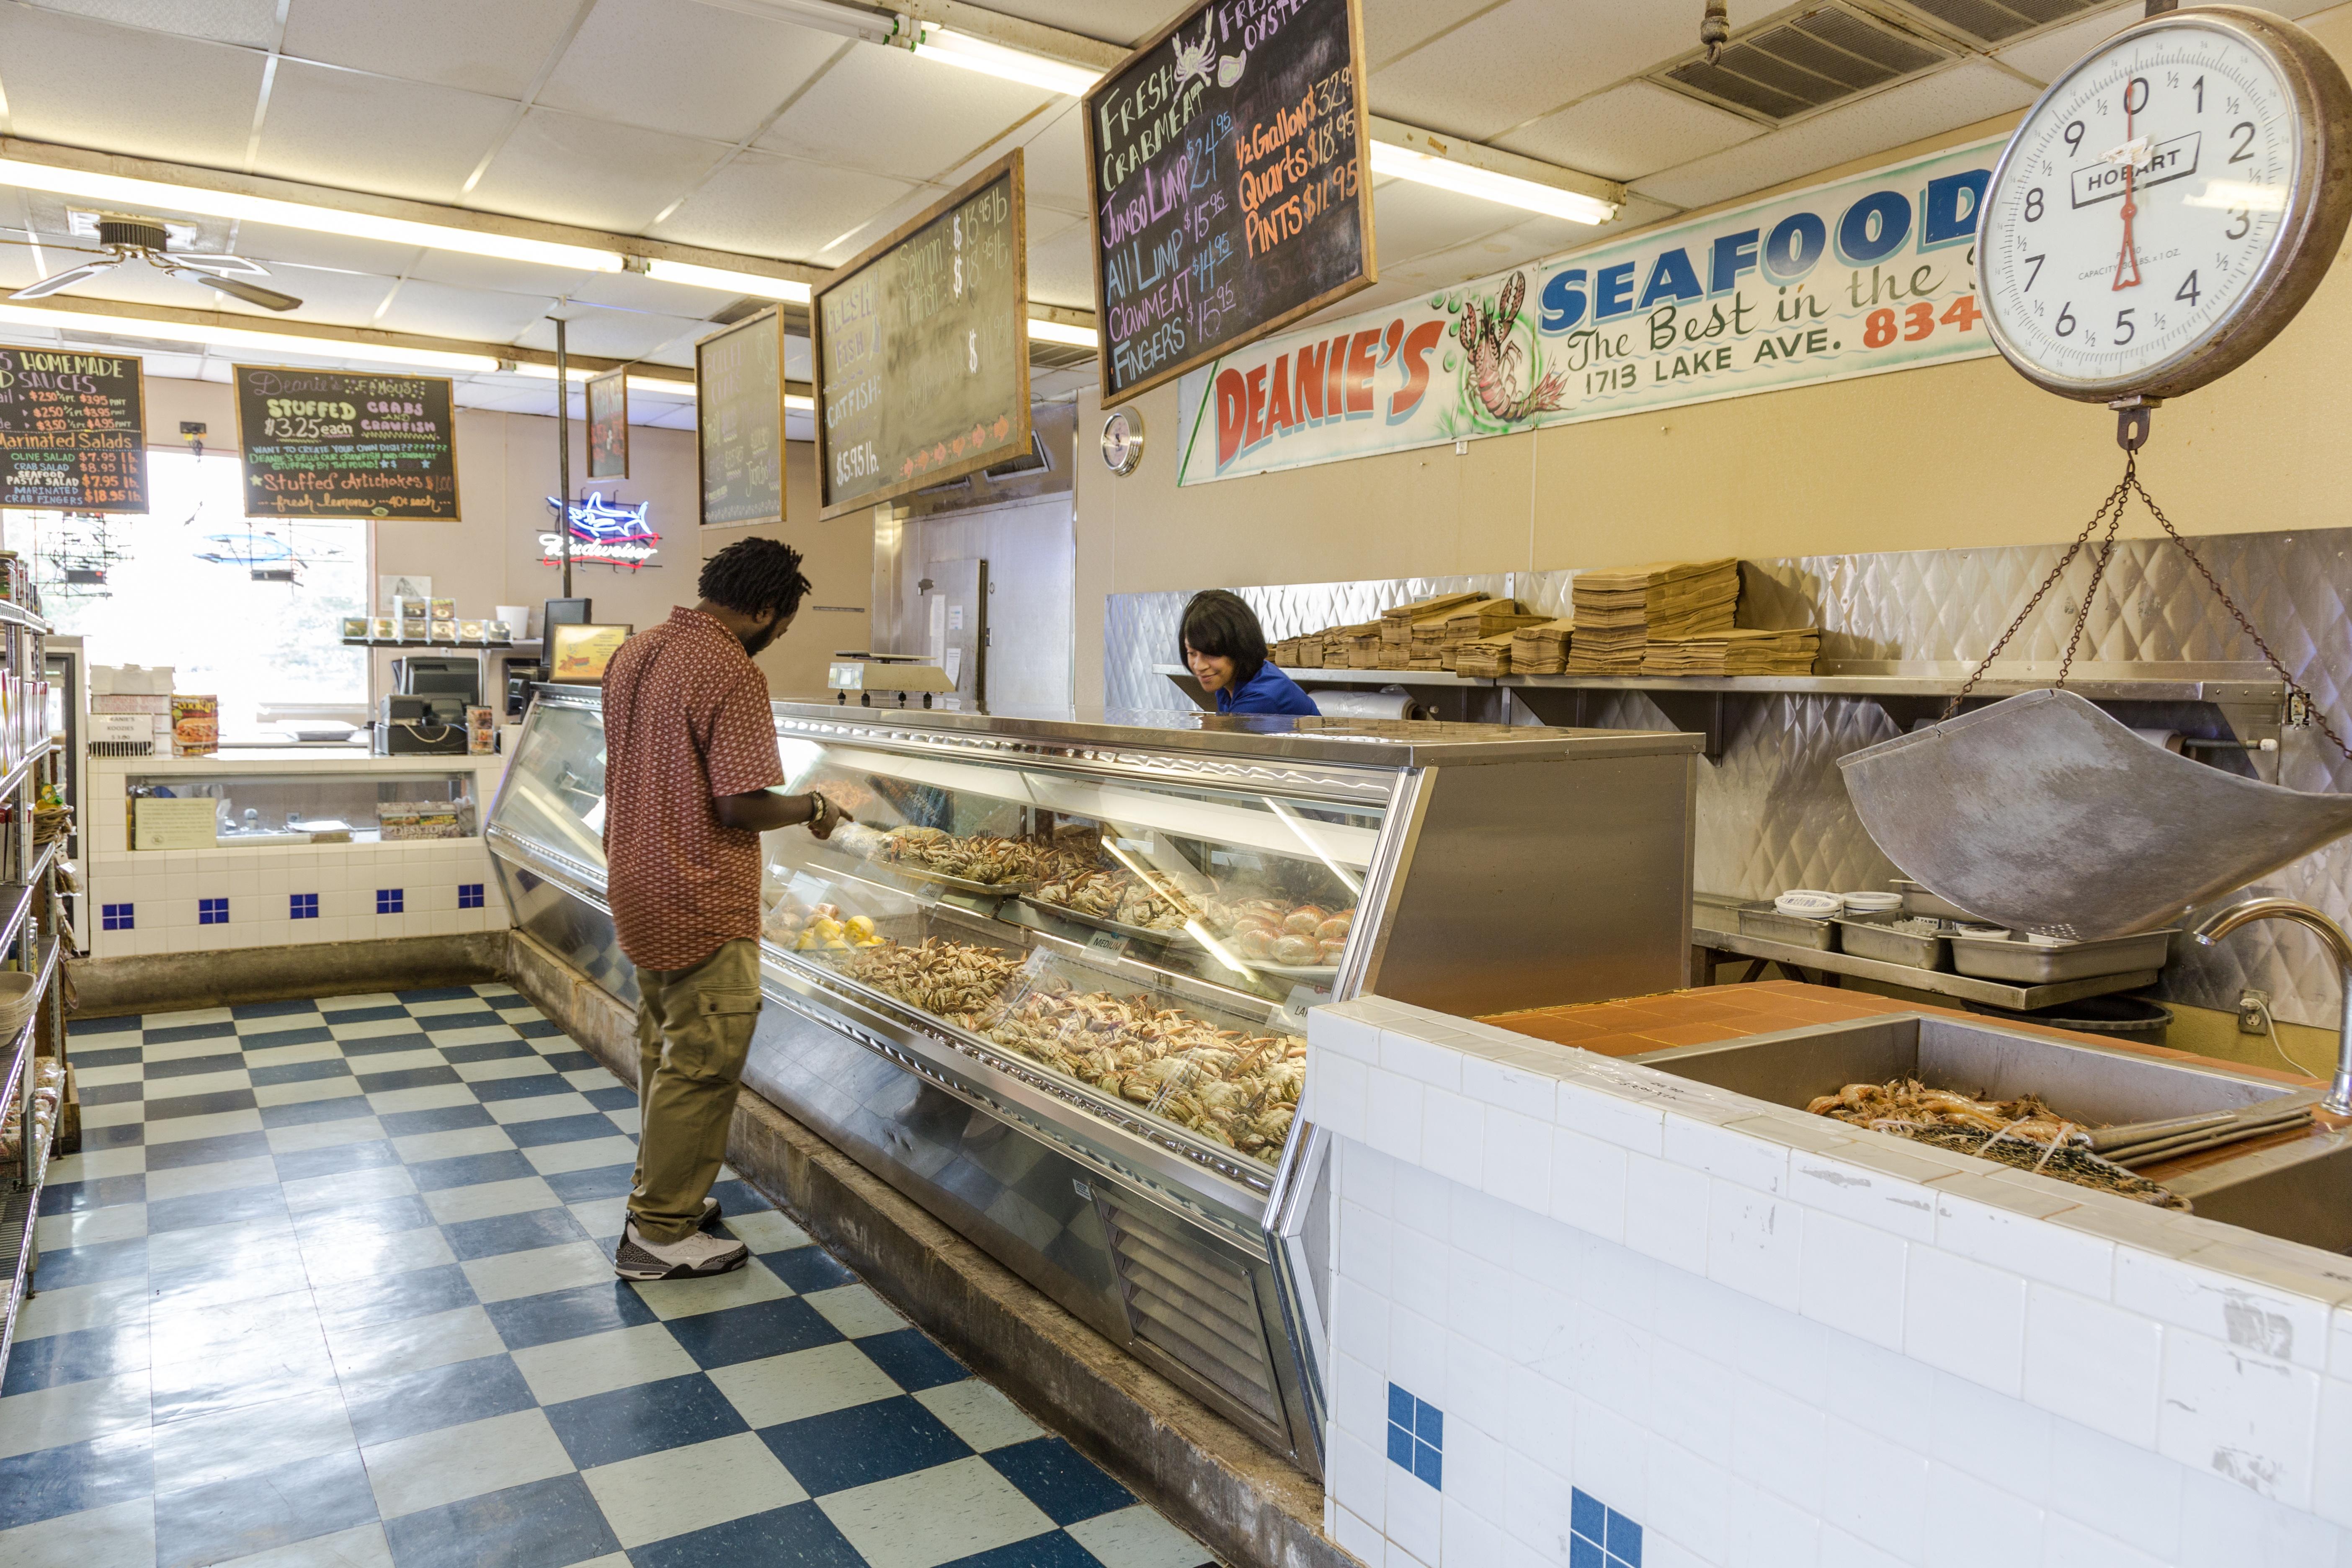 Deanies_Seafood_Market_Bucktown_Metairie_Crawfish_Seafood_louisiana